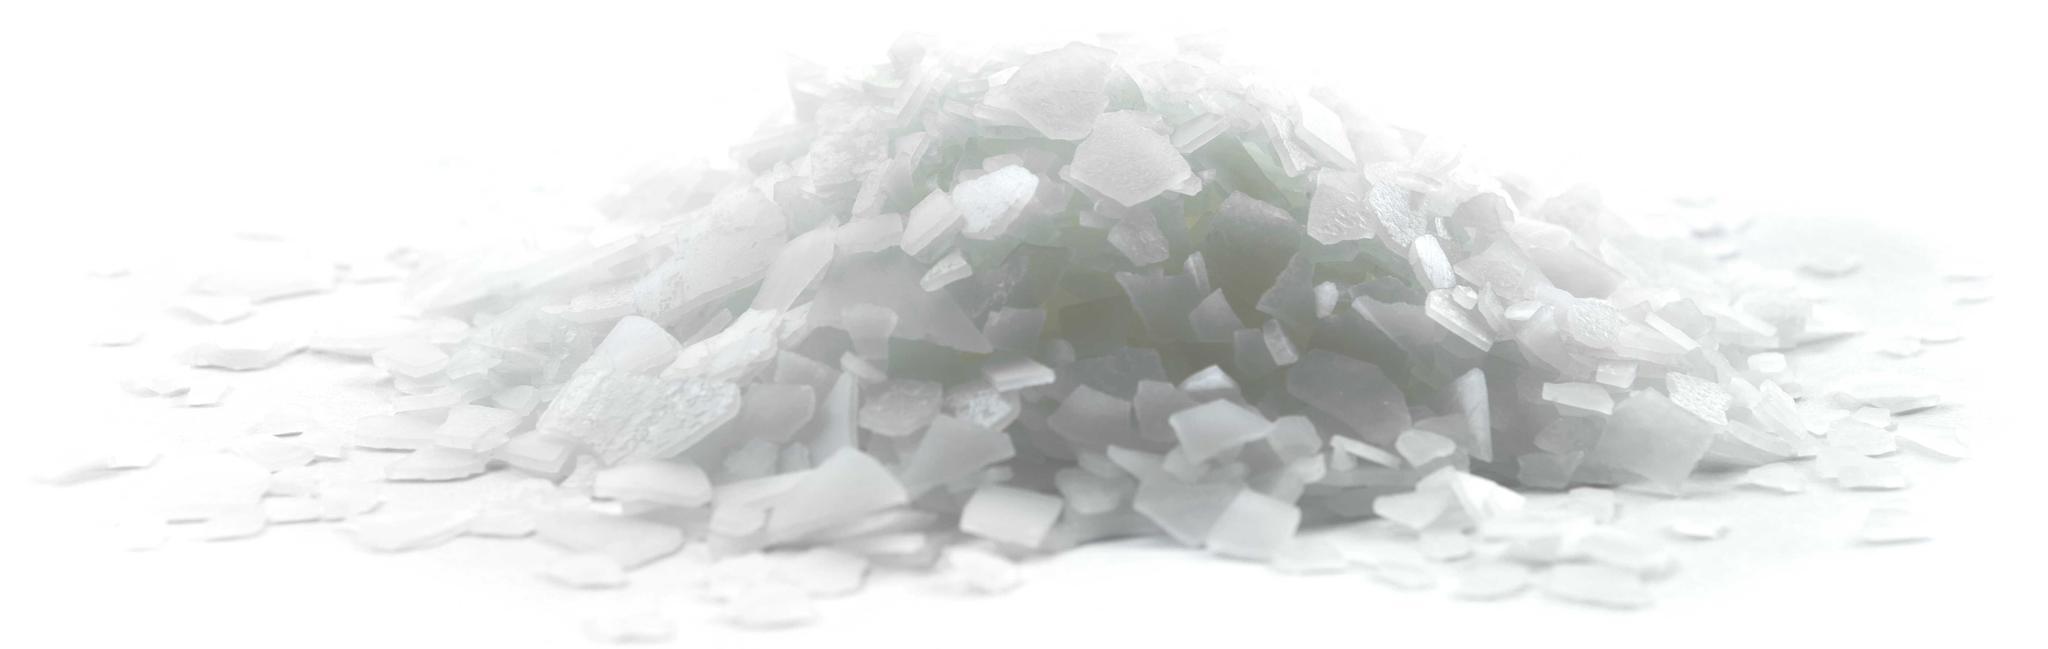 Magnesium van bodyrevitaliser bodyrevitaliser - Witte salontafel thuisbasis van de wereldberoemde ...